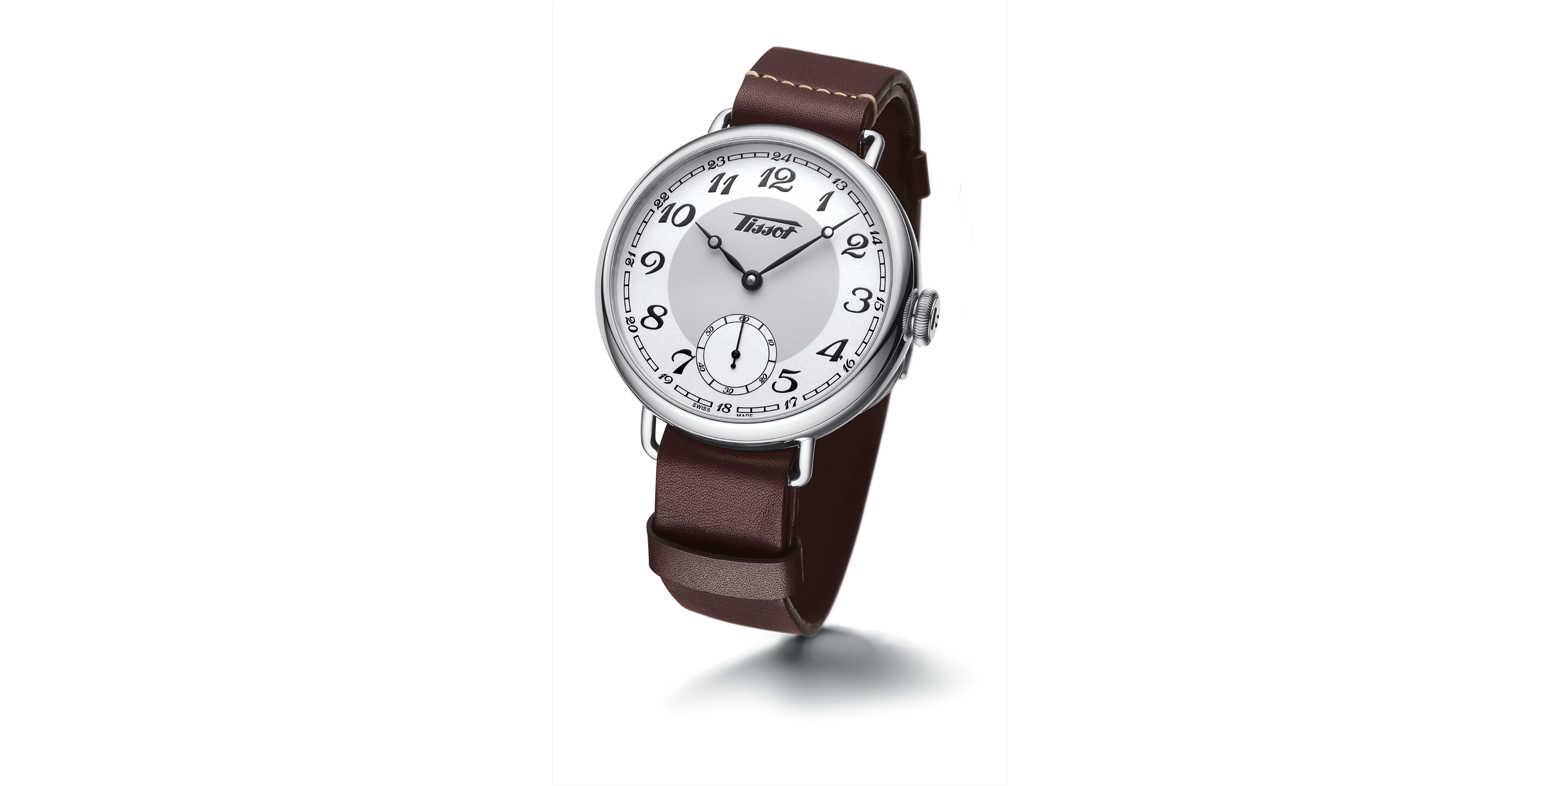 "16e9f08cb0 ""腕時計への革命期""である1936年に存在していた〈ティソ〉のコレクションを再解釈した""ティソ ヘリテージ 1936""。"